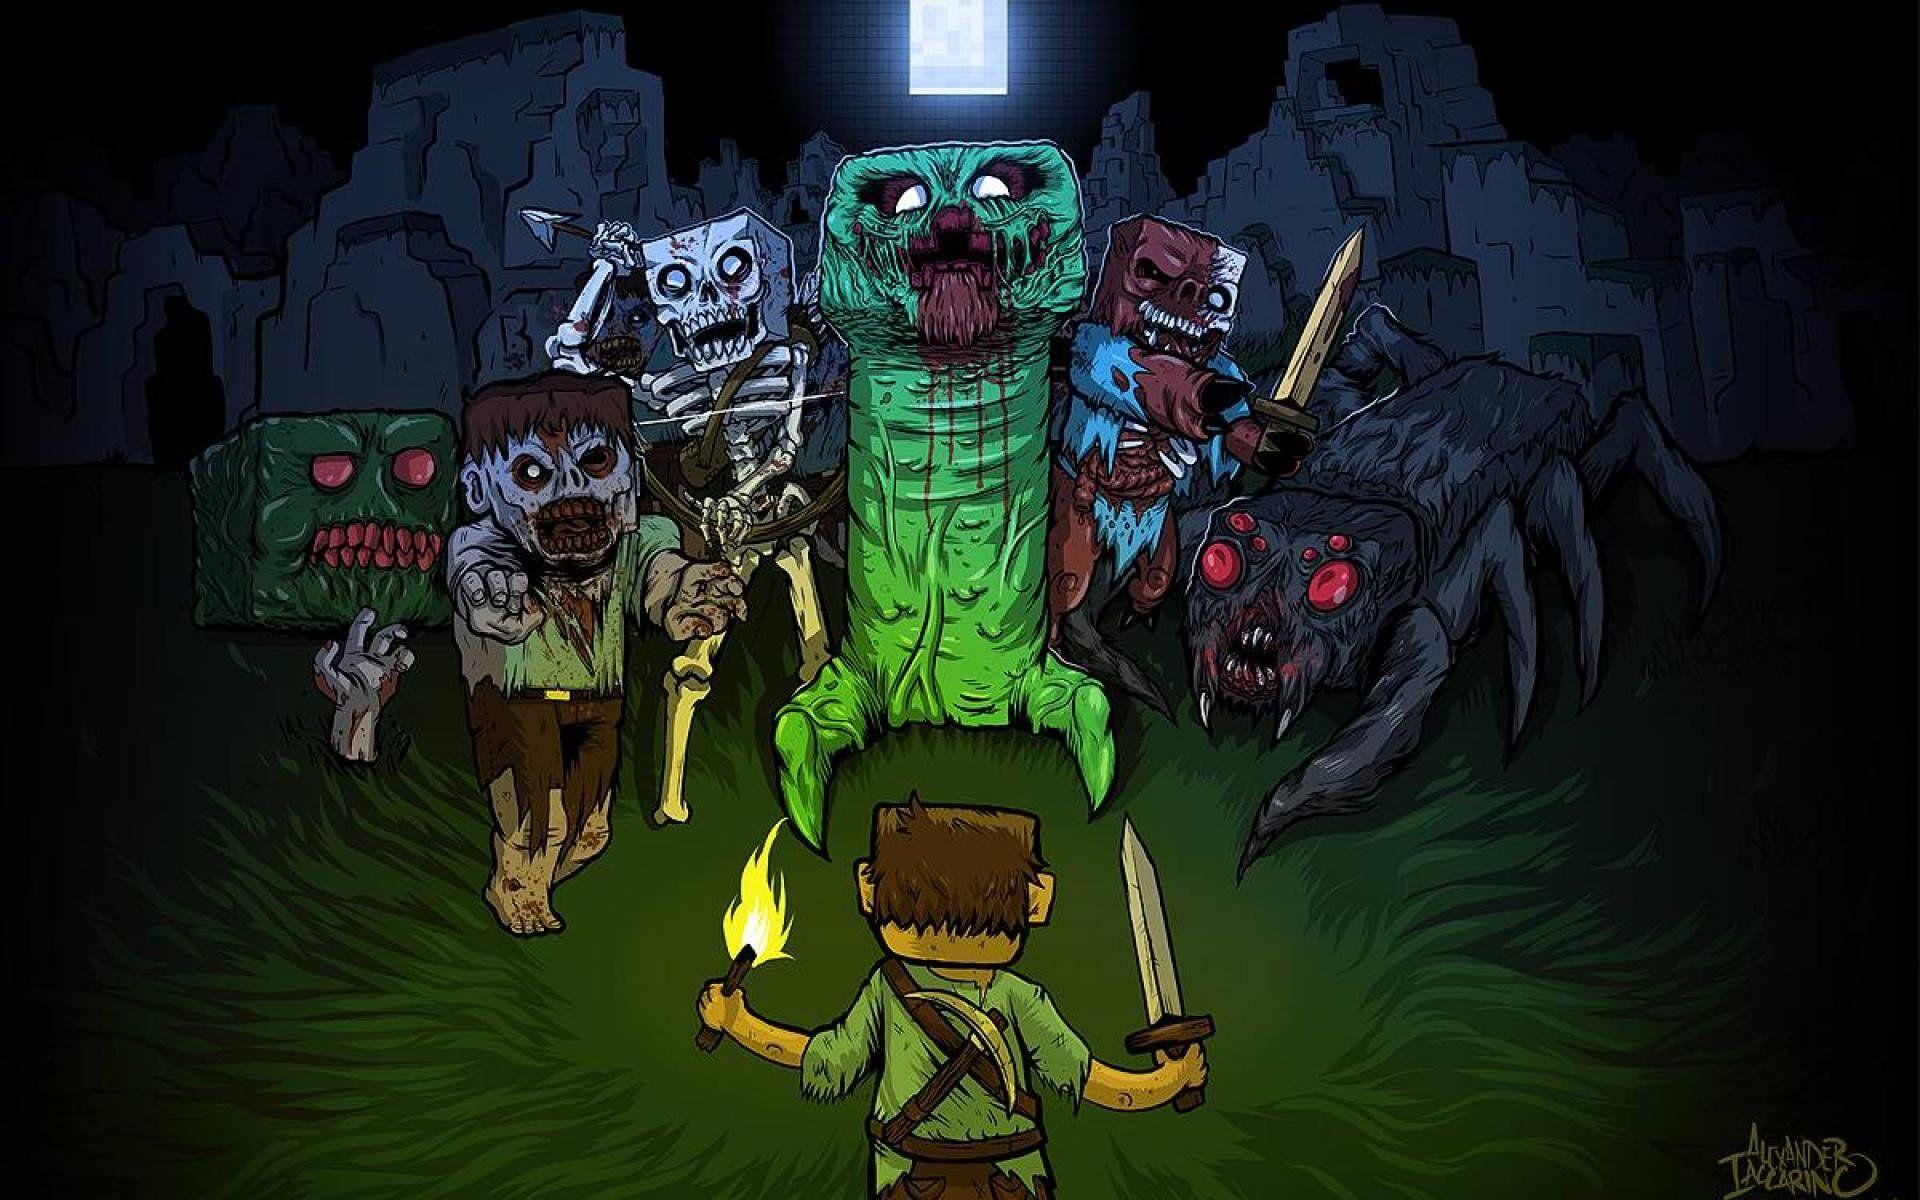 Most Inspiring Wallpaper Minecraft Art - ae32c8f284f8a04898e67a691e86427e  Trends_85632.jpg